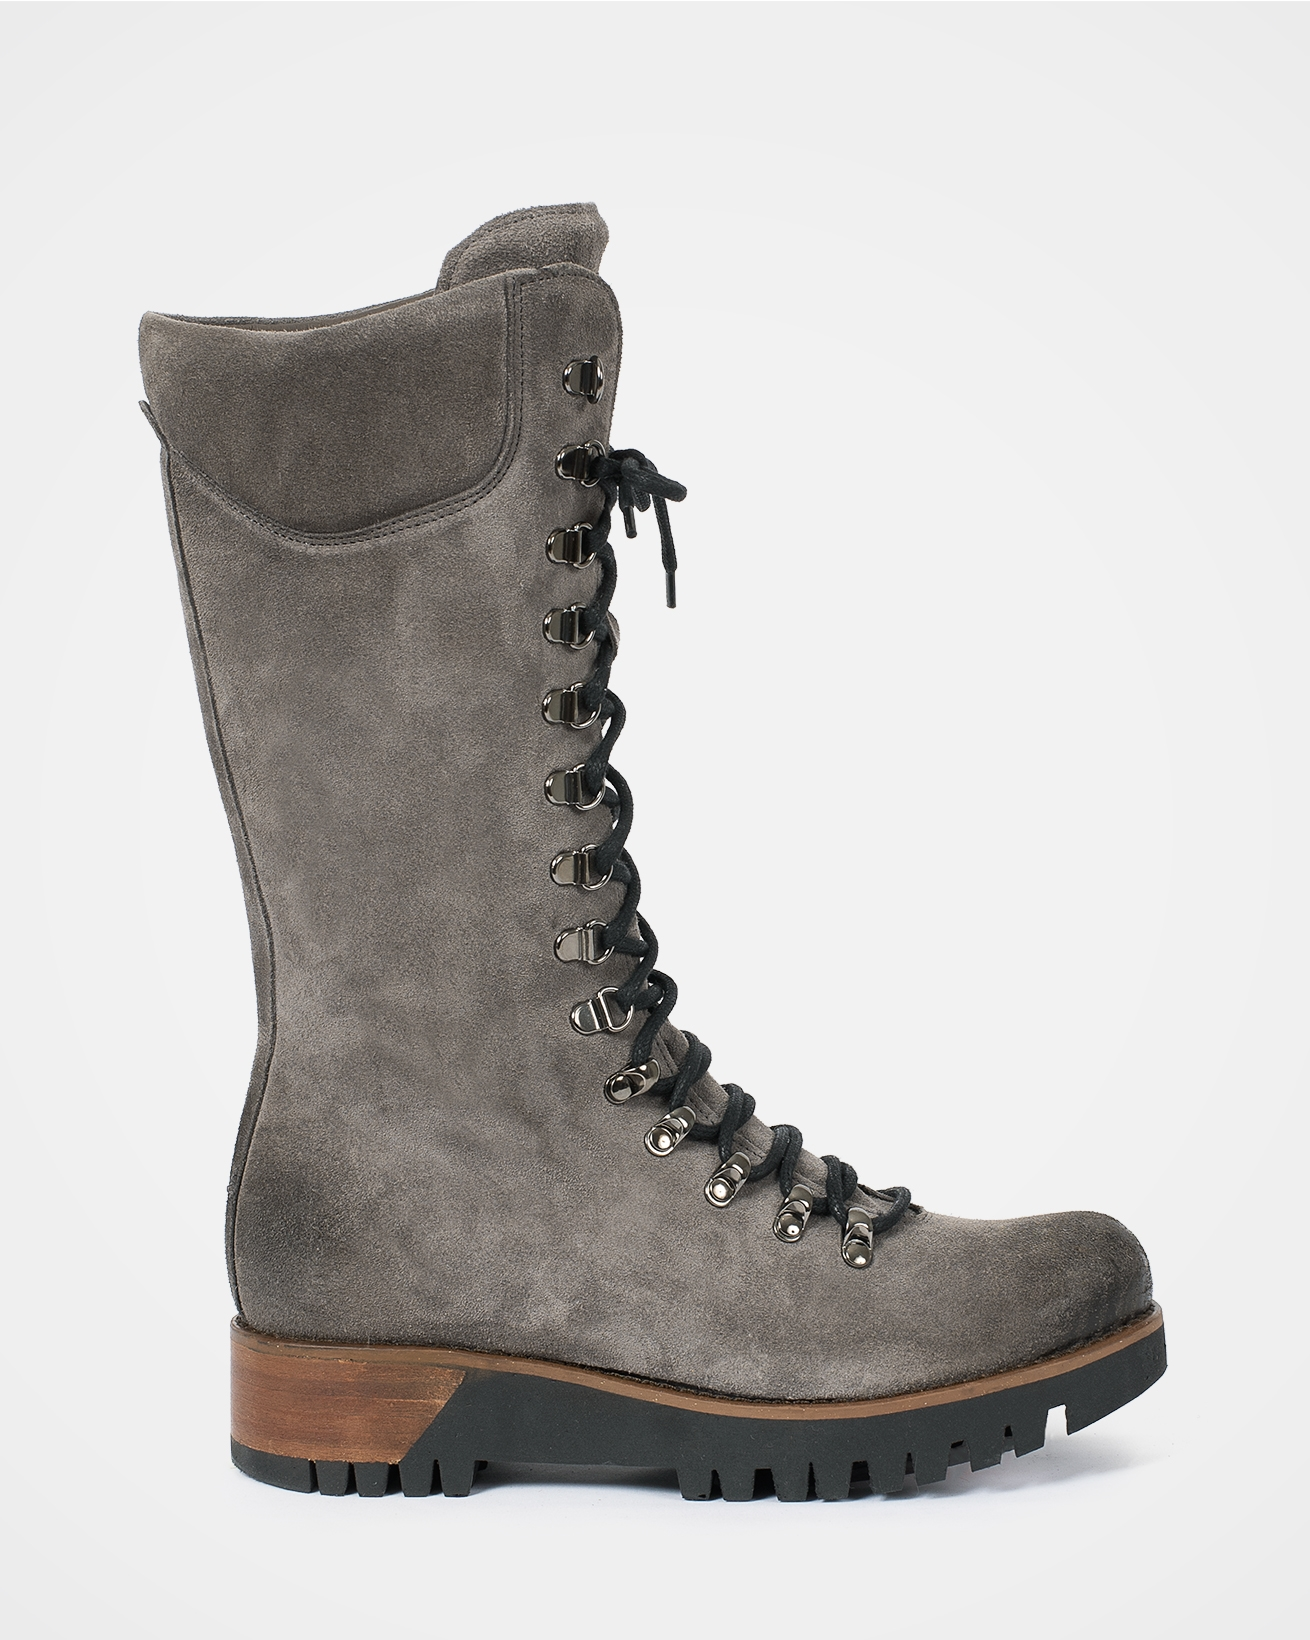 7082_wilderness-boots_grey_outside.jpg